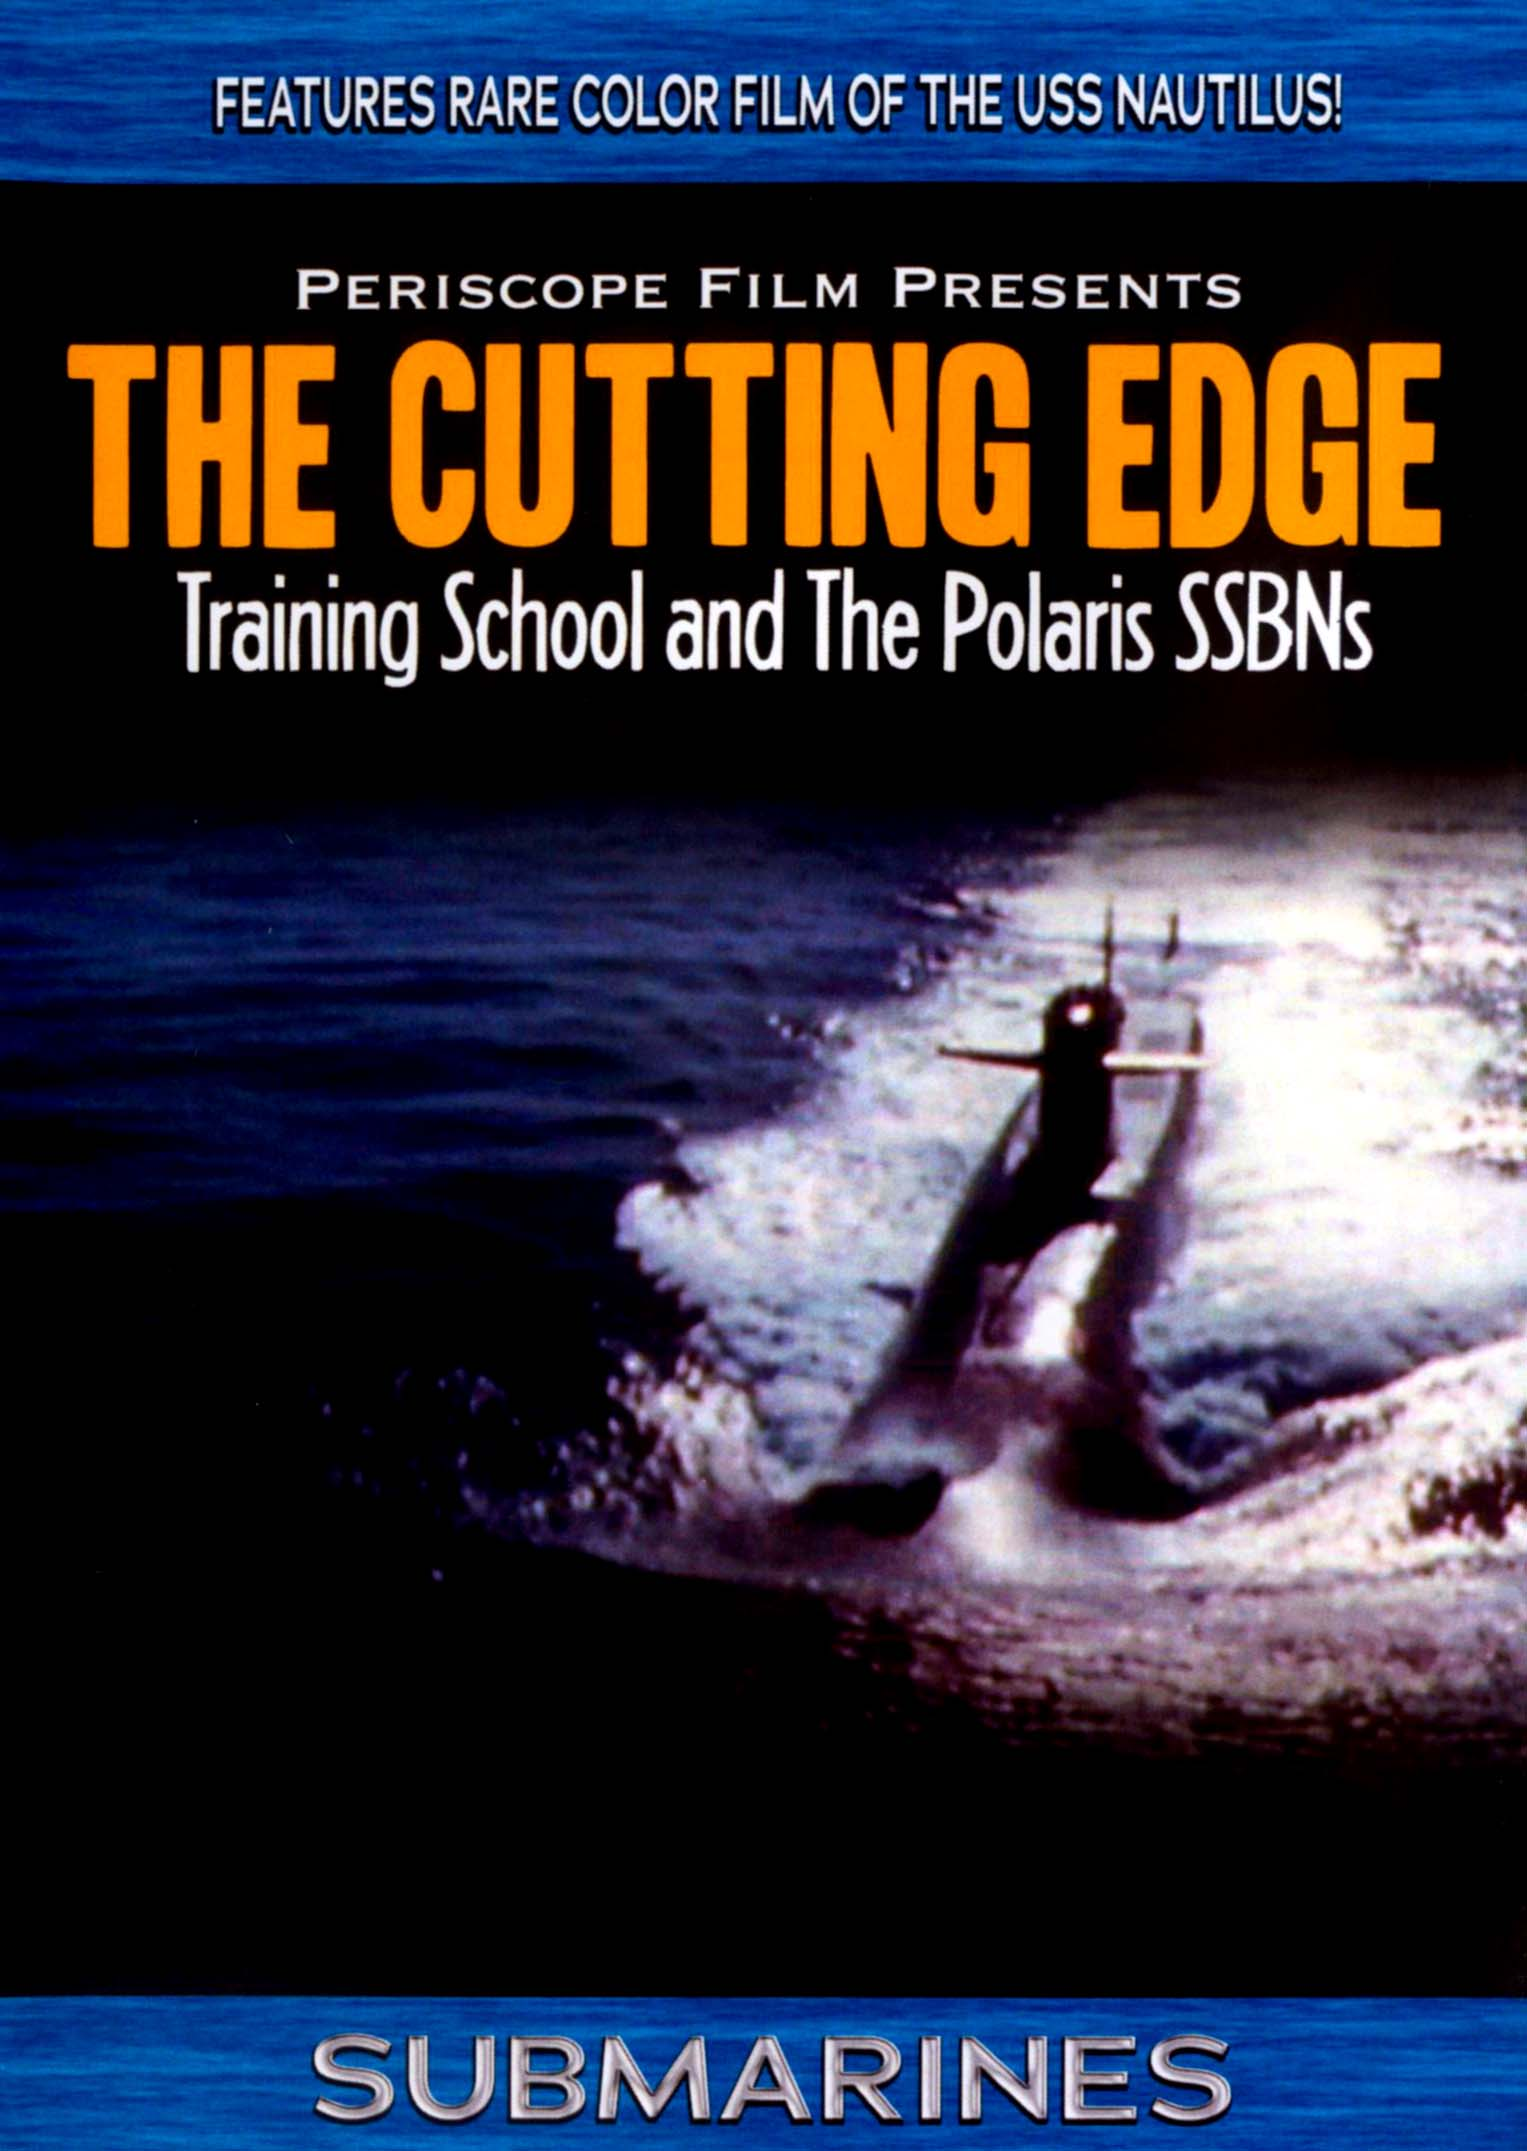 Cutting Edge: Training School and the Polaris SSBNs